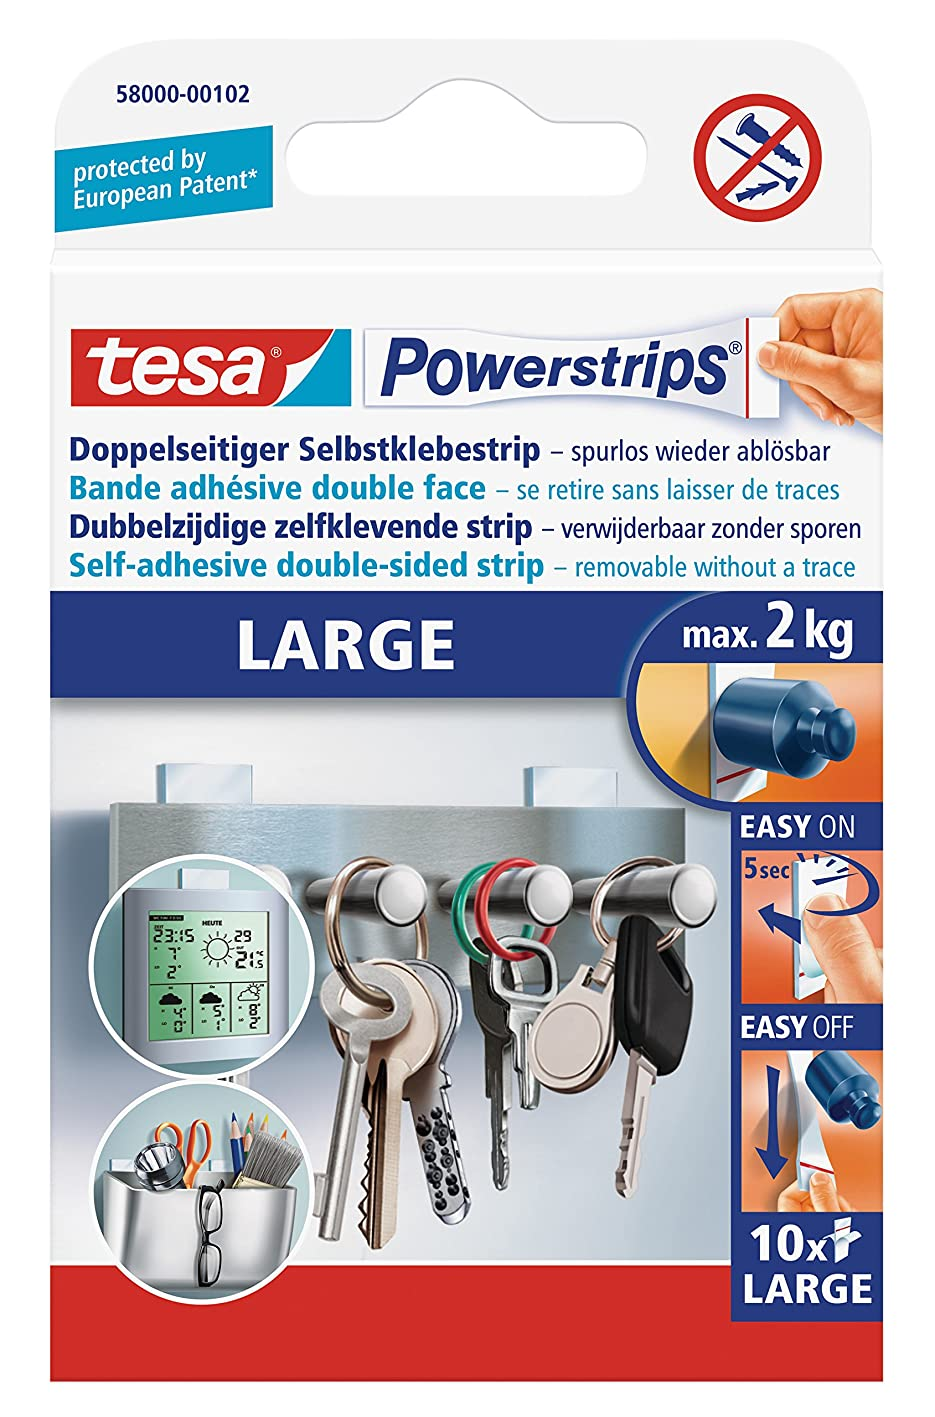 tesa UK Ltd 58000-00104-02 Powerstrips Large Removable Self Adhesive Strips - 10 Strips jdsnrxqctmd263